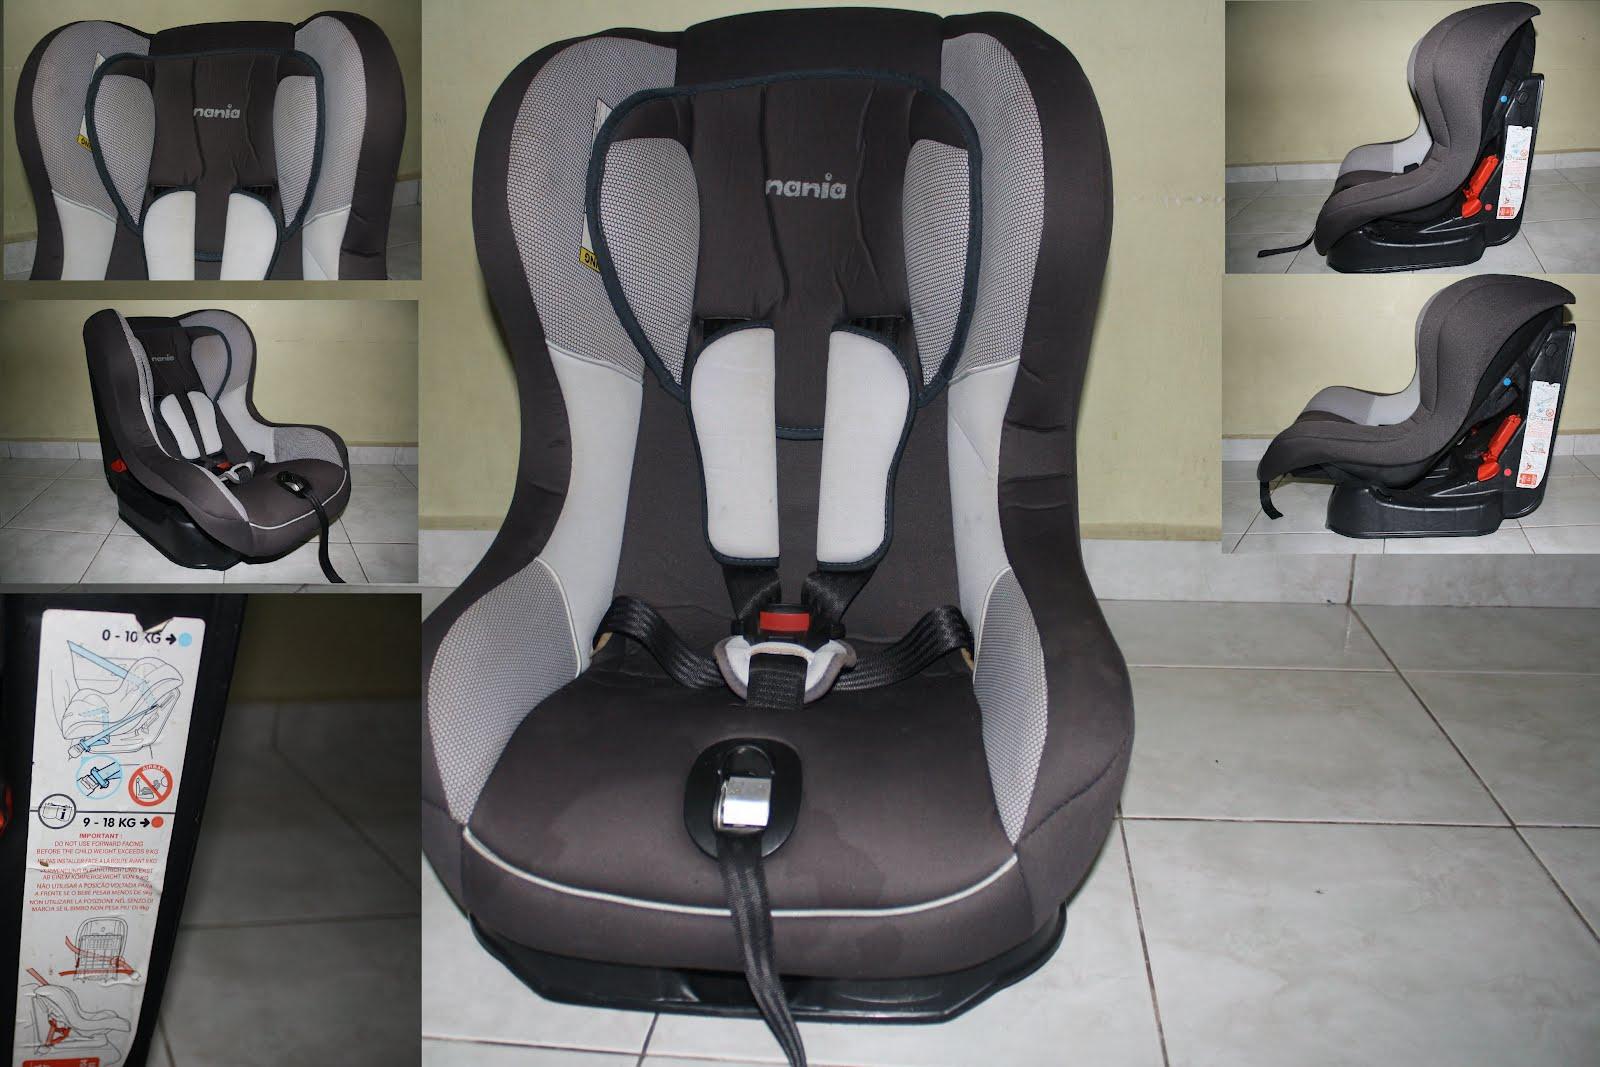 //Letsgrab.blogspot.com: Nania Car Seat